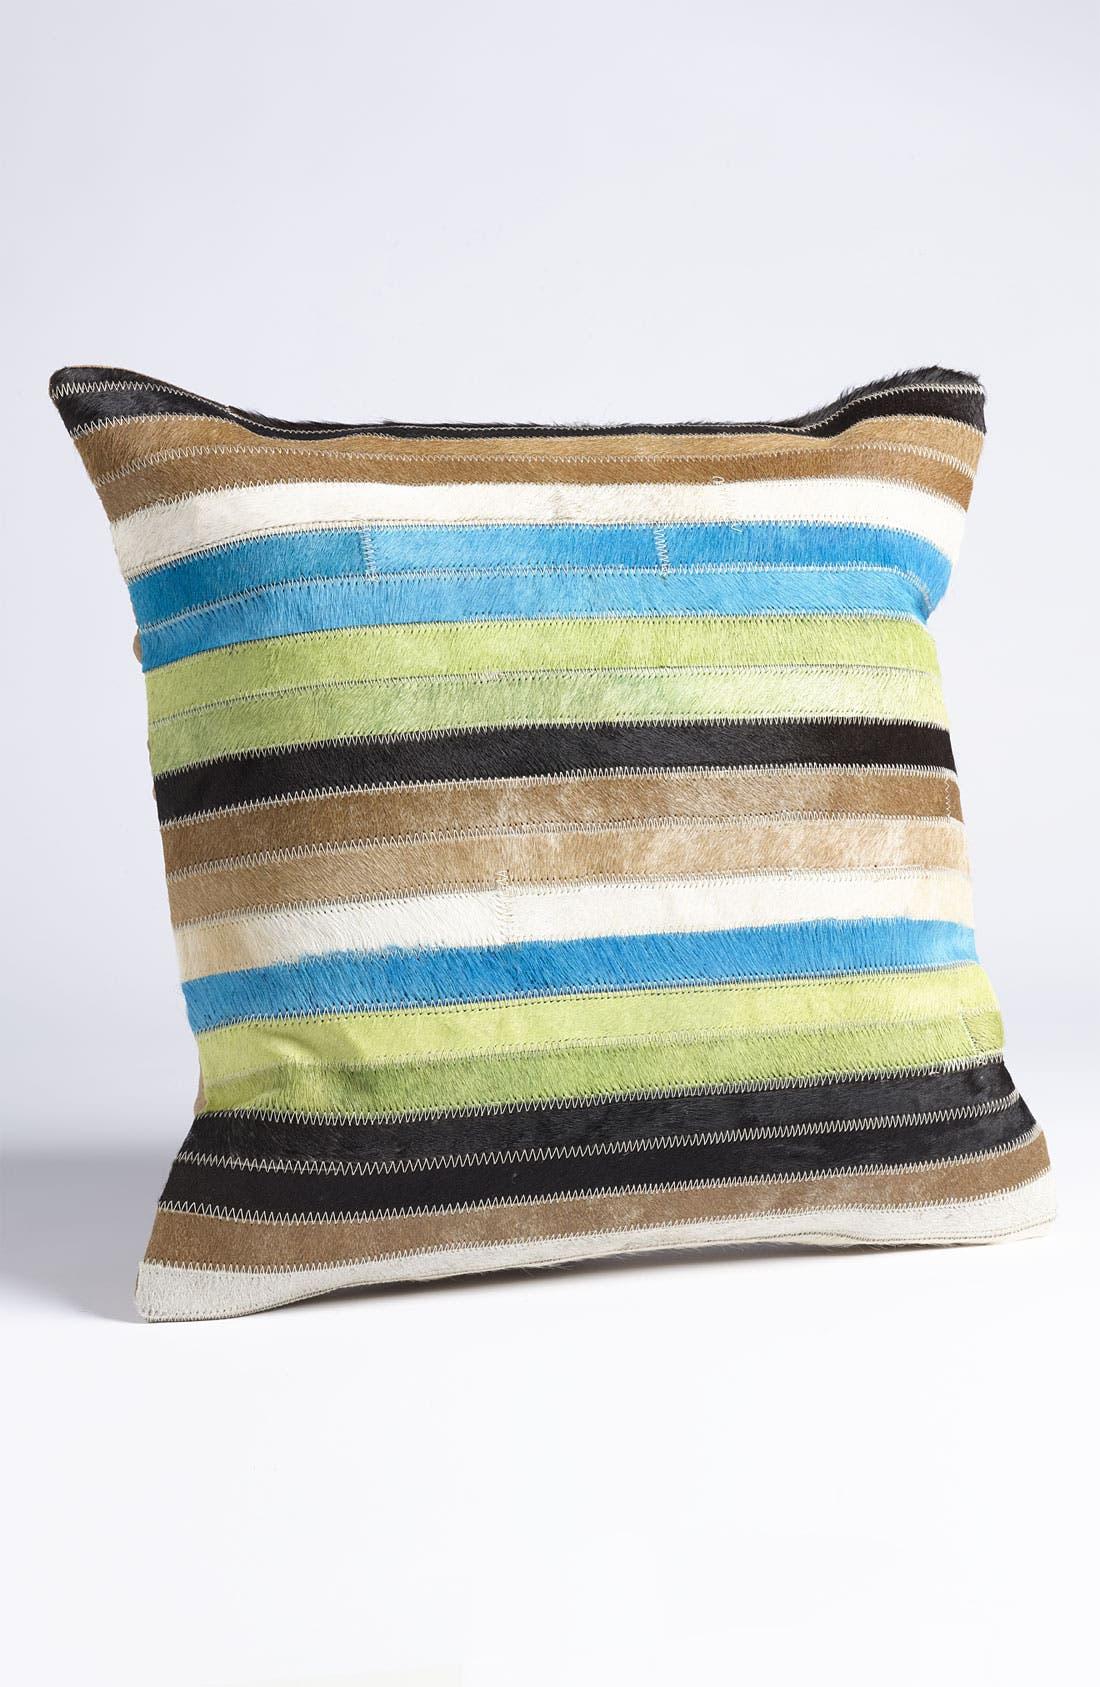 Alternate Image 1 Selected - Mina Victory 'Fun Stripes' Pillow